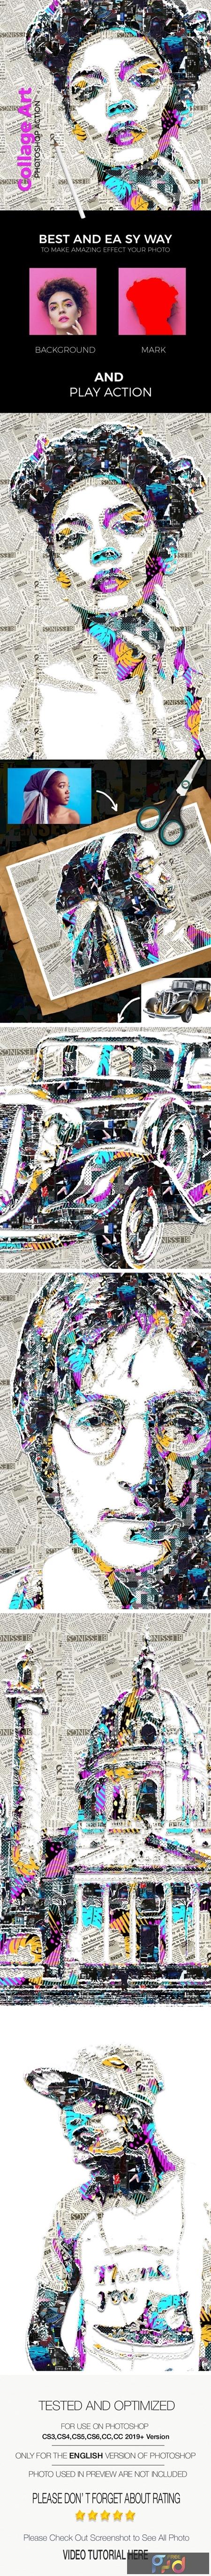 Collage Art Photoshop Action 24972417 1